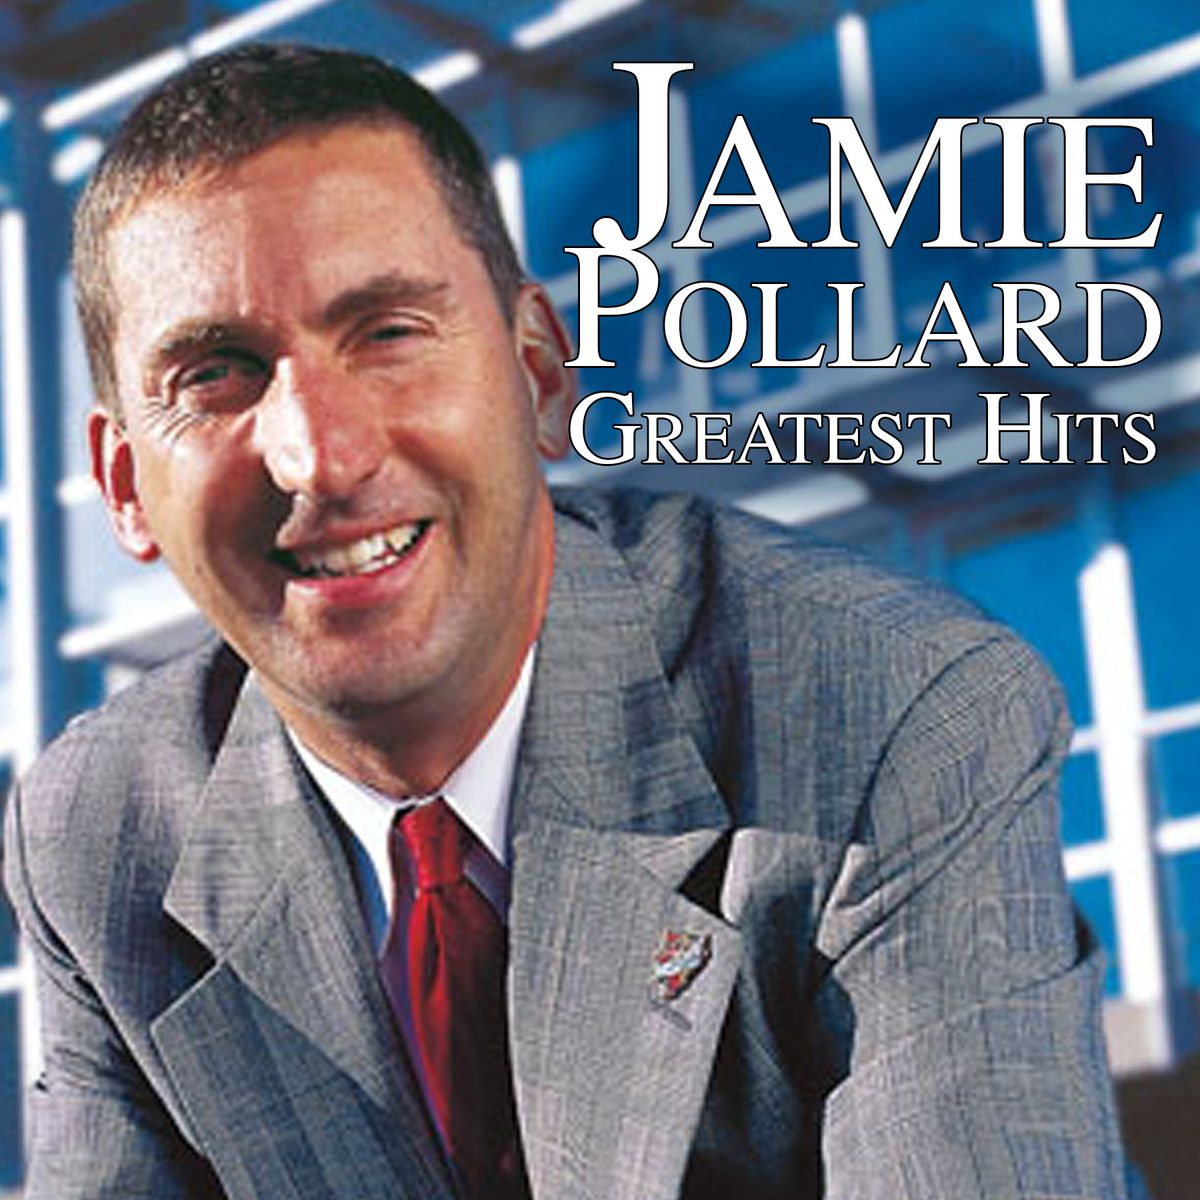 Jamie Pollard's Greatest Hits